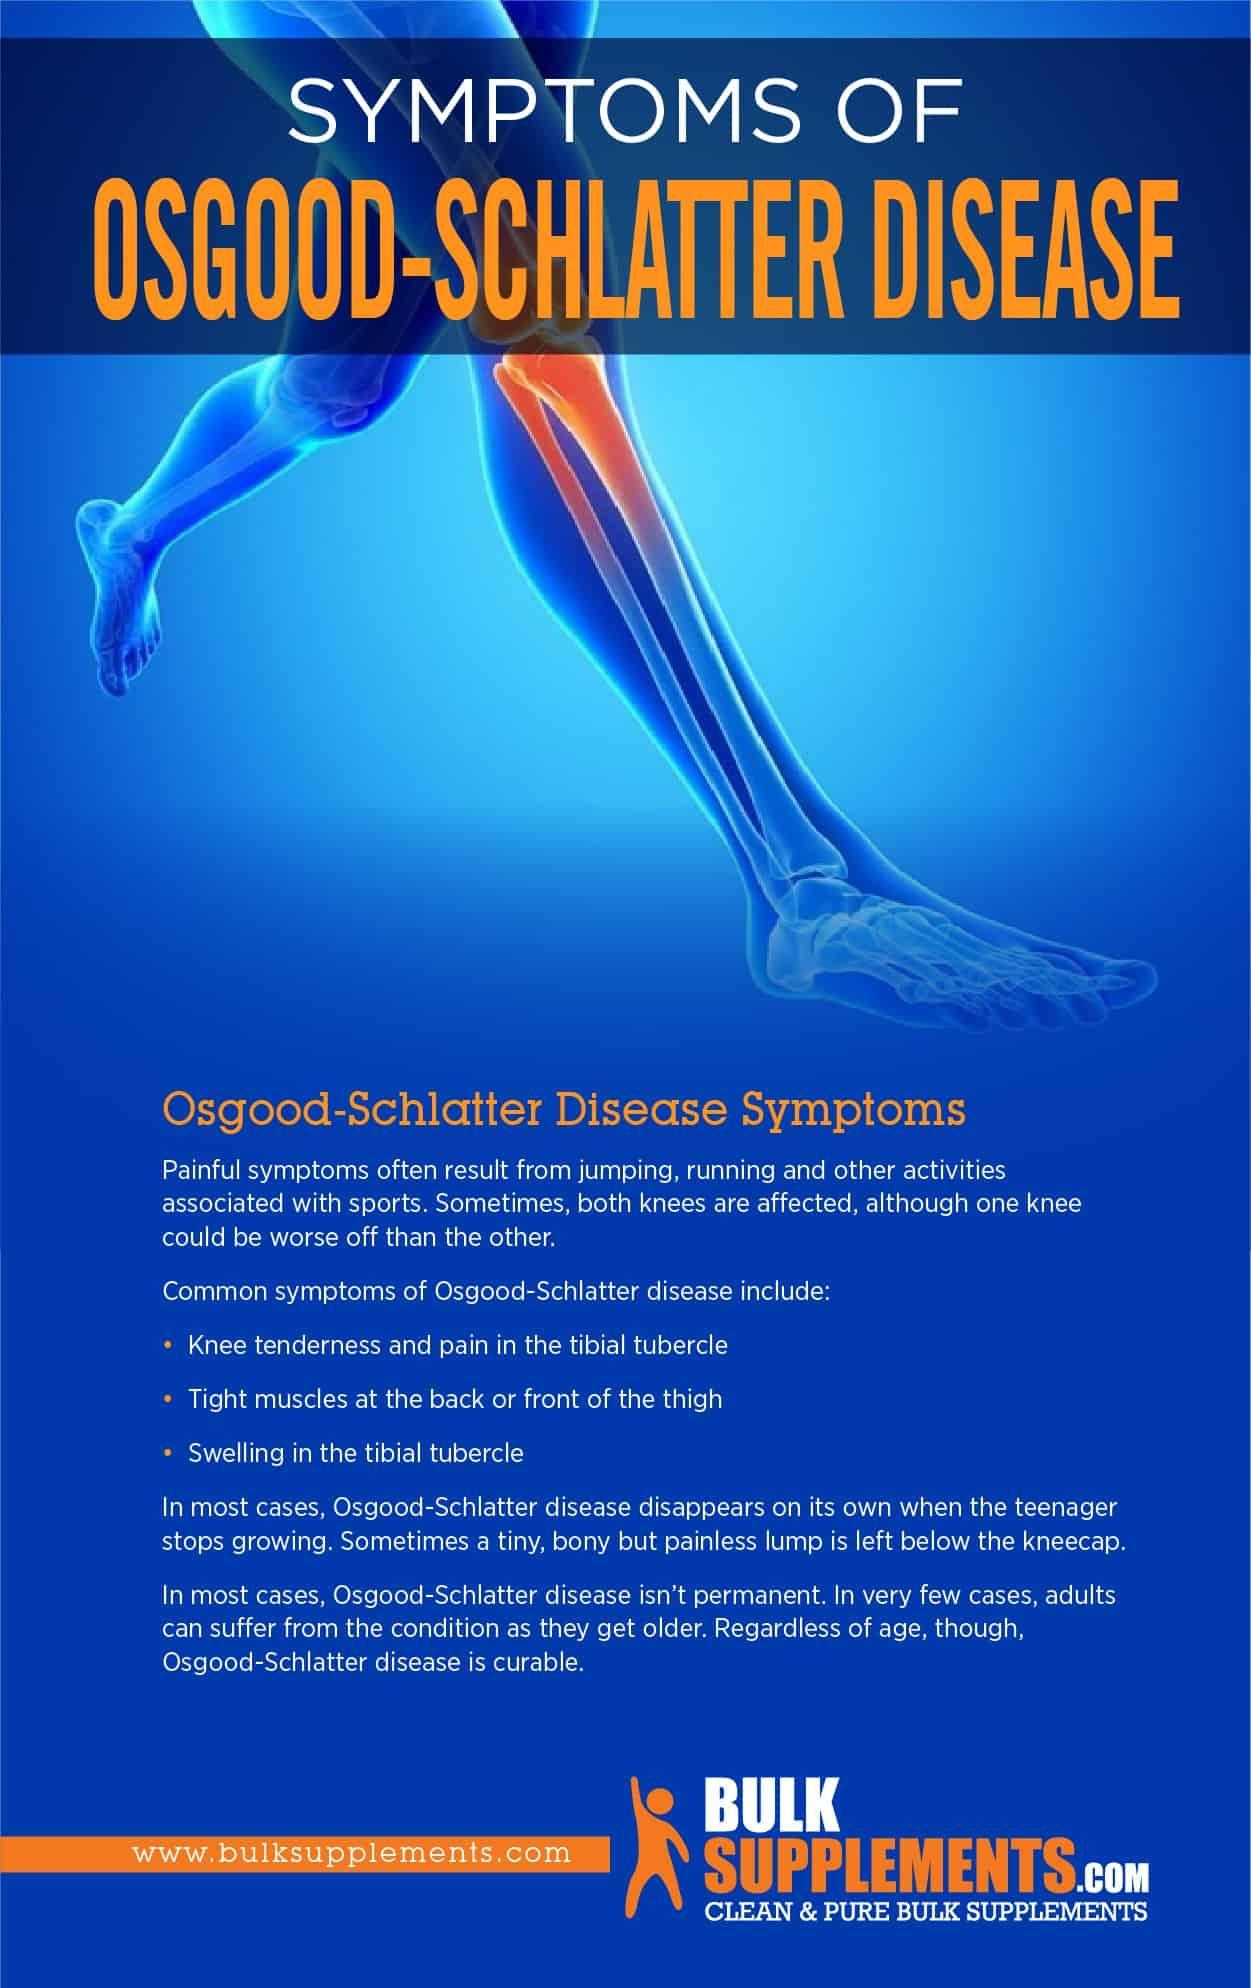 Osgood-Schlatter Disease Symptoms